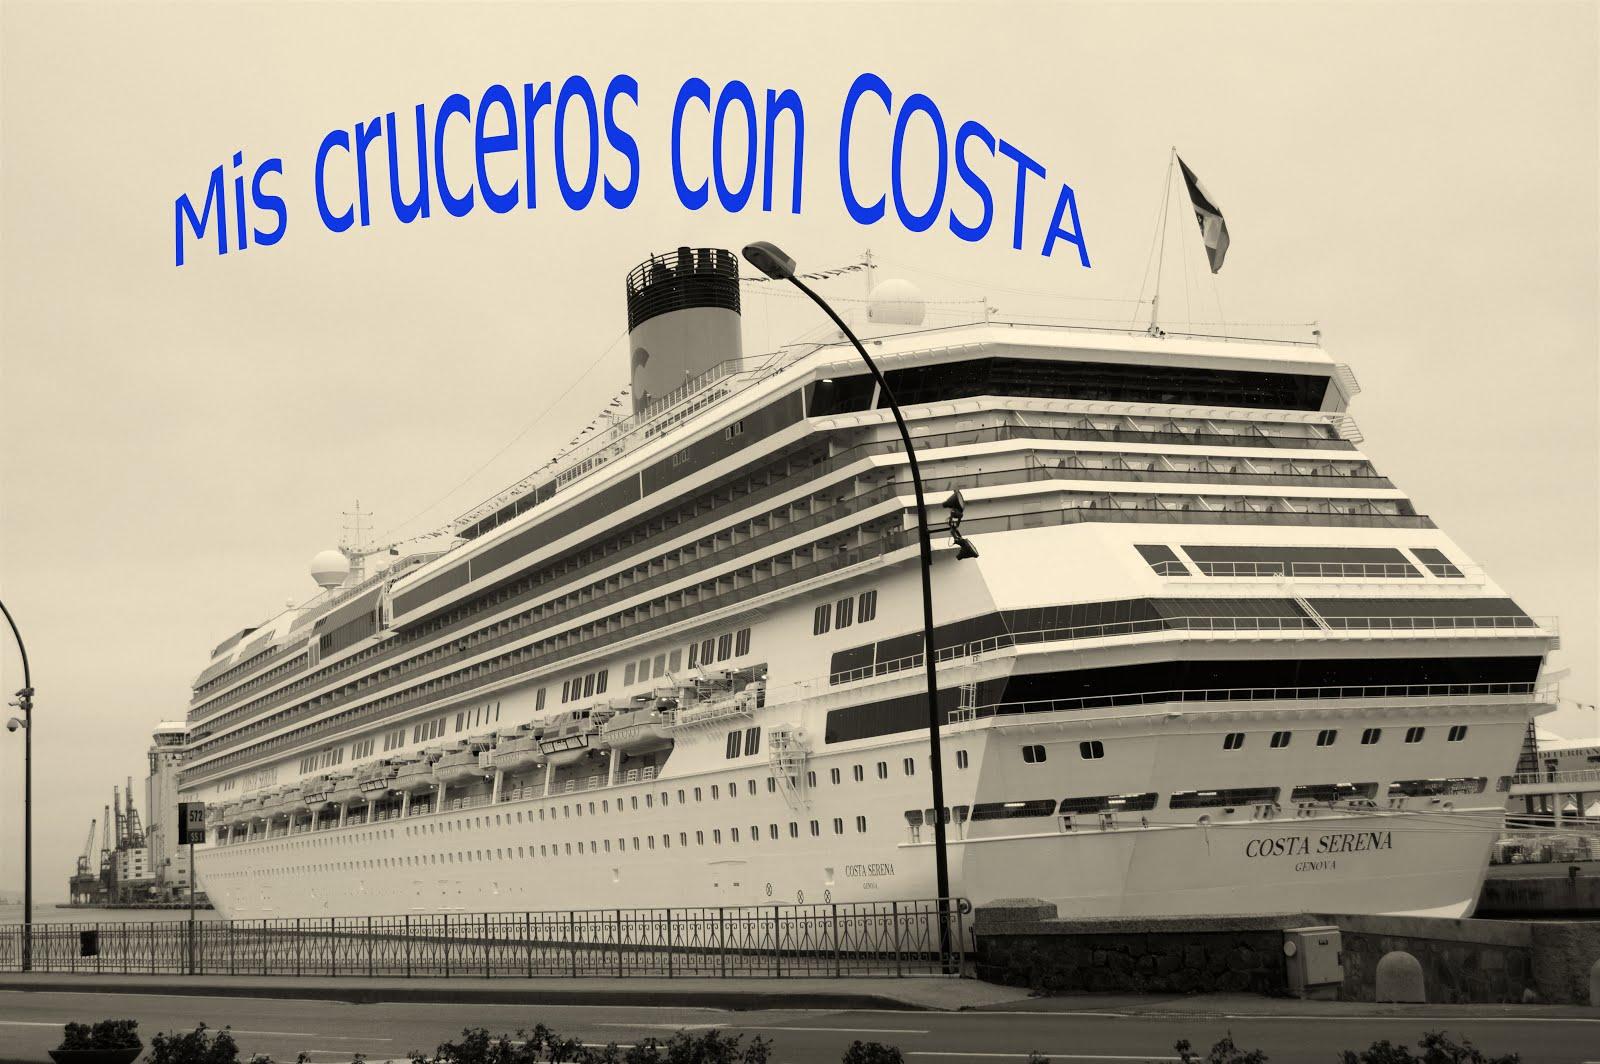 MIS CRUCEROS CON COSTA